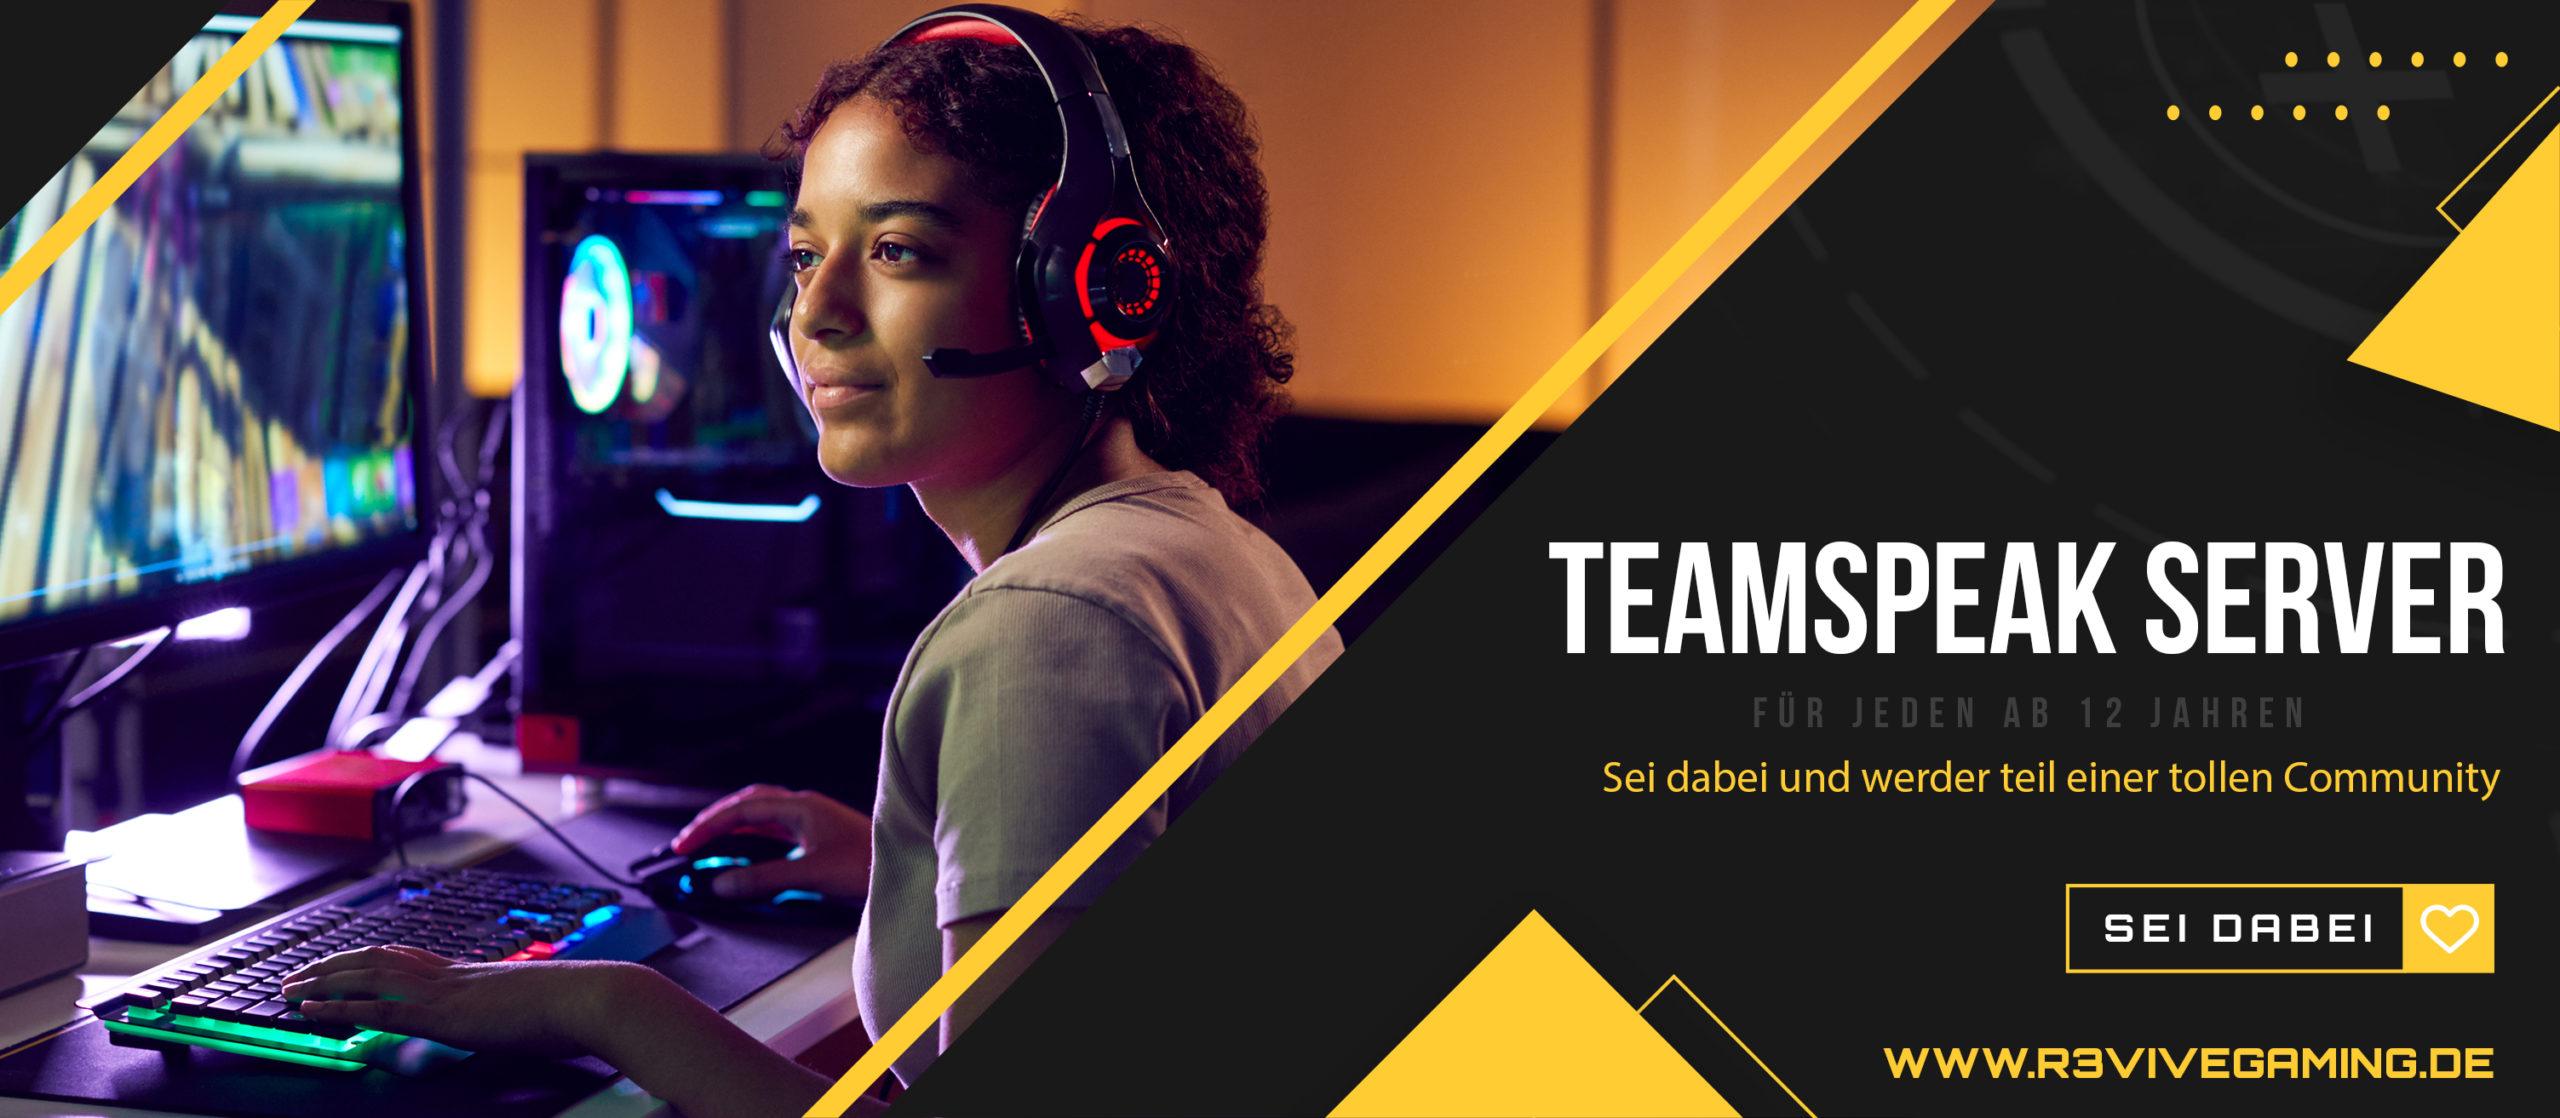 TS scaled » Streamer » Gaming Homepage » Logo Design